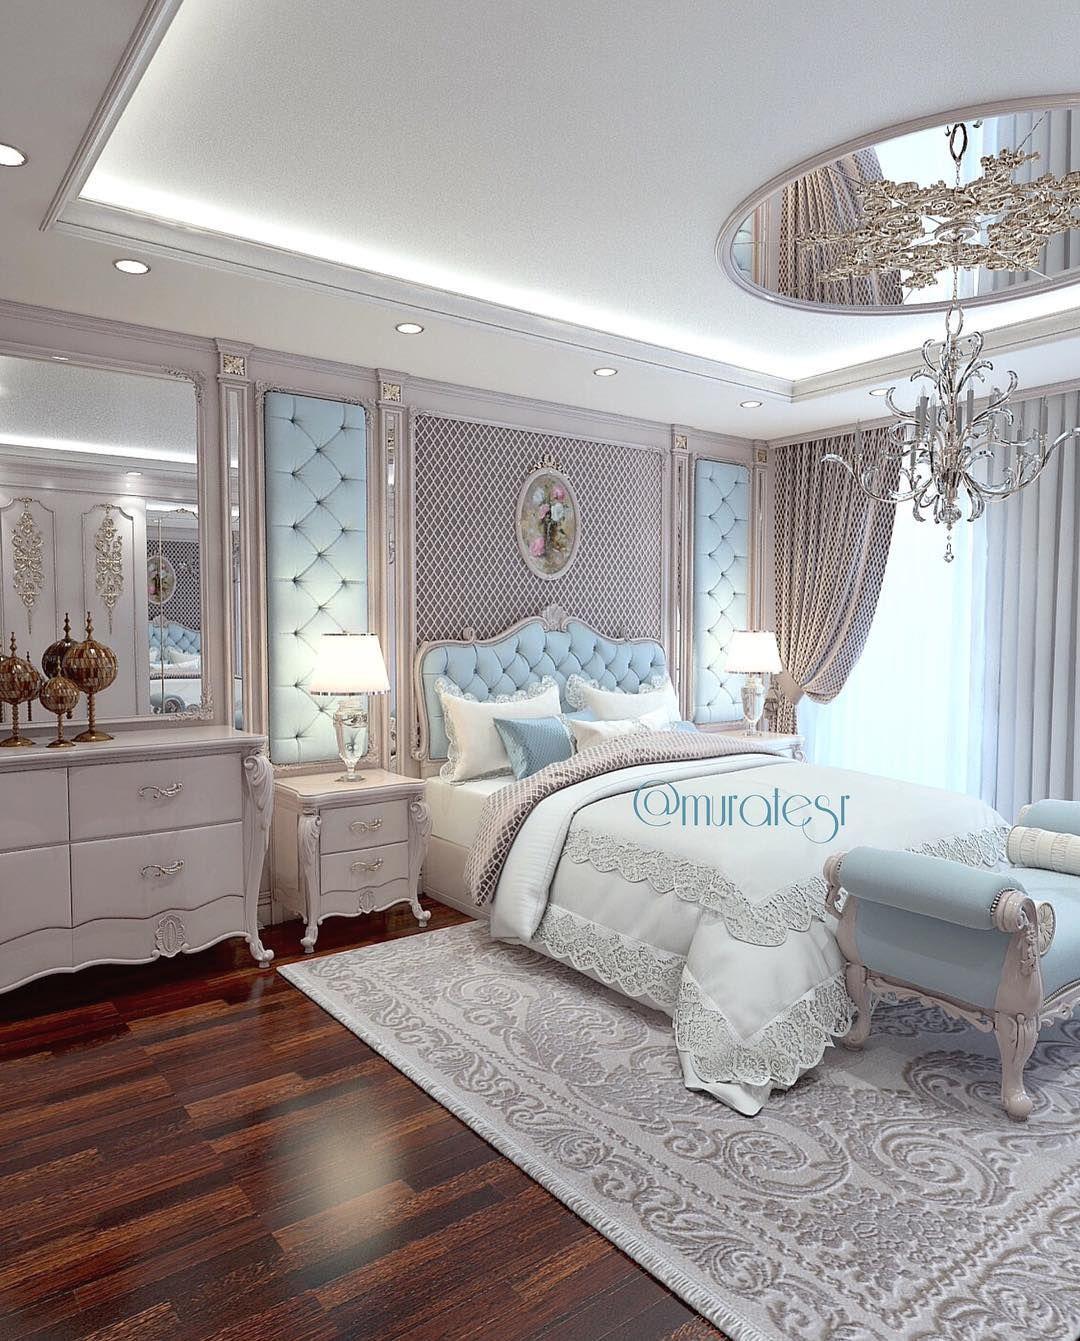 Bedroom Design Vintage Bedroom Rug Ideas Dark Grey Accent Wall Bedroom Bedroom Sets Evansville Indiana: Pin By Sabrina Giles On Bedroom Walls